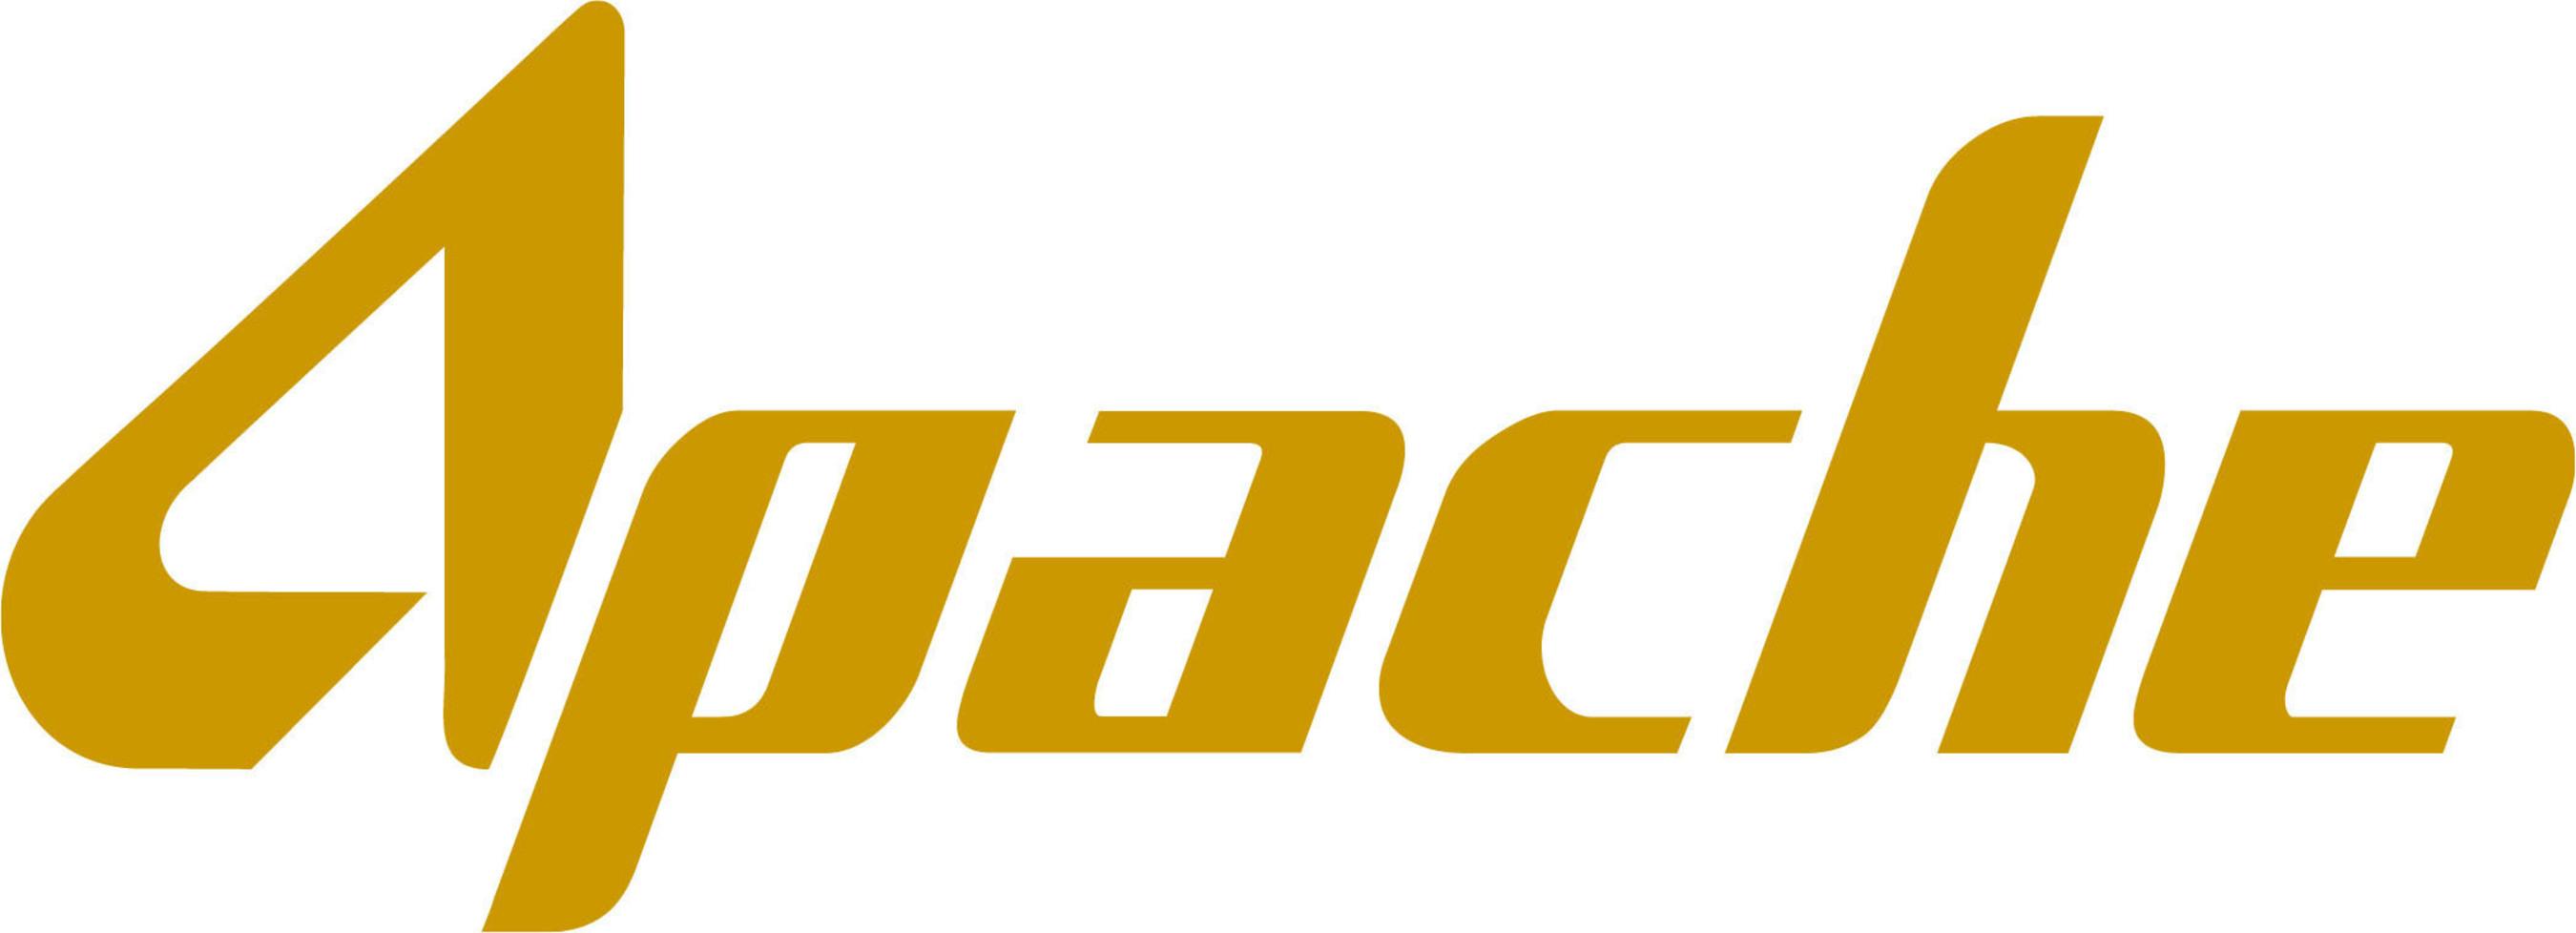 Logo for the Apache Corporation (NYSE, Nasdaq: APA).